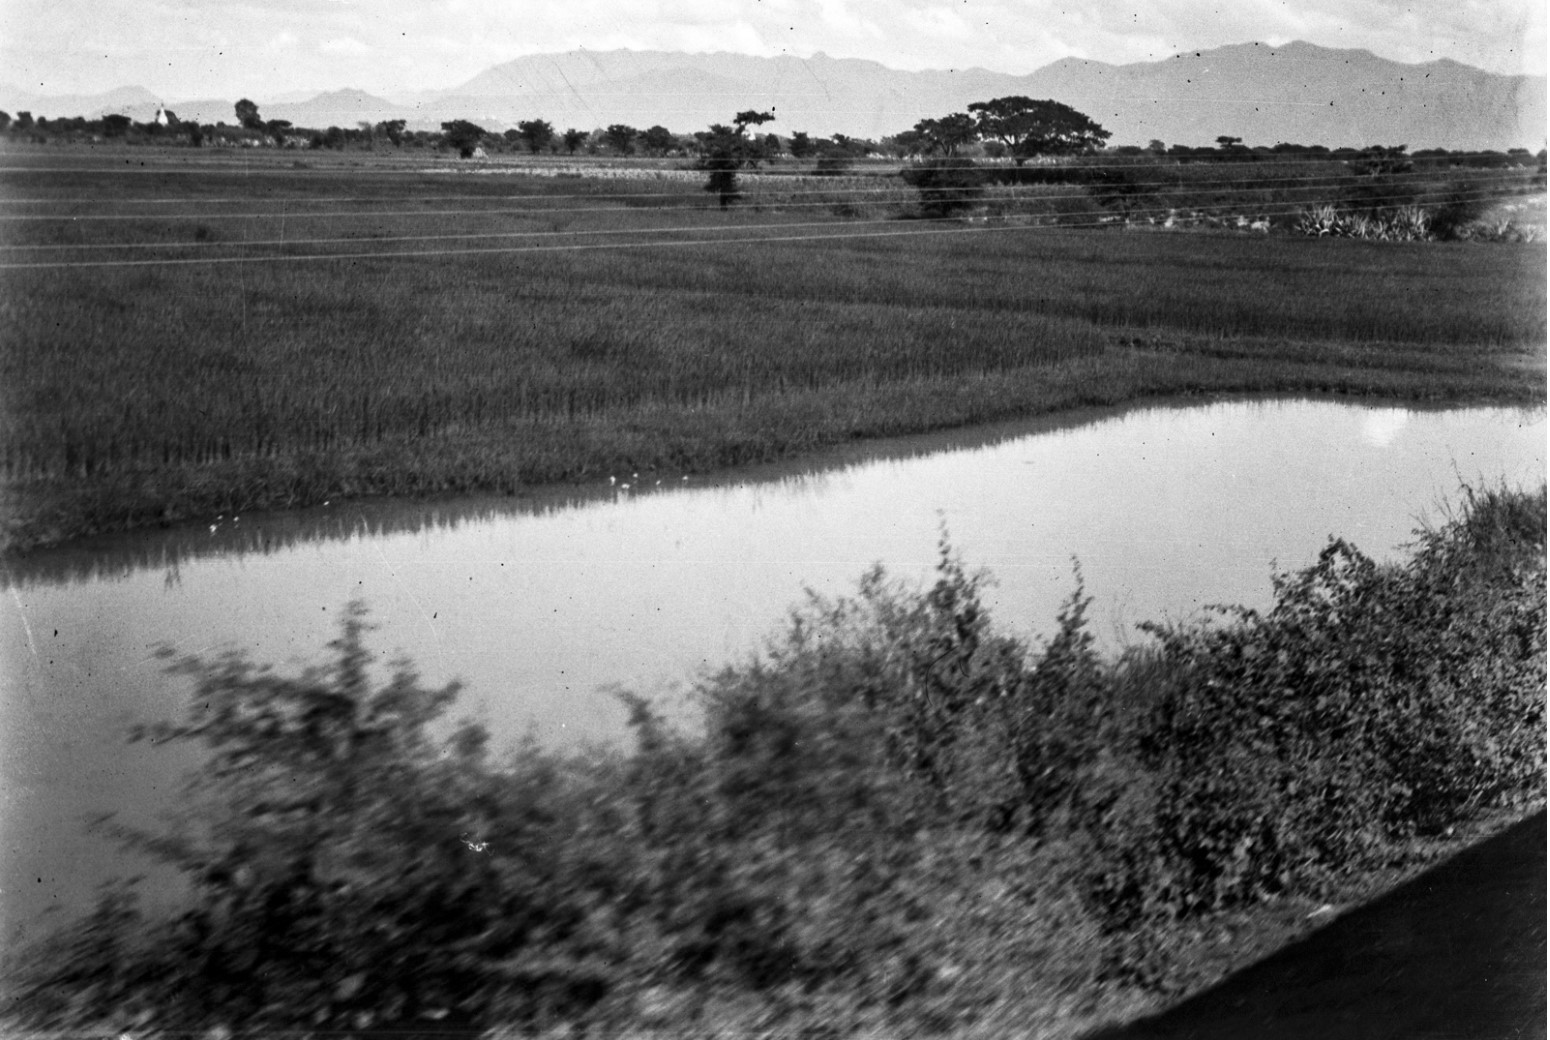 1075. Мандалай. Пейзаж